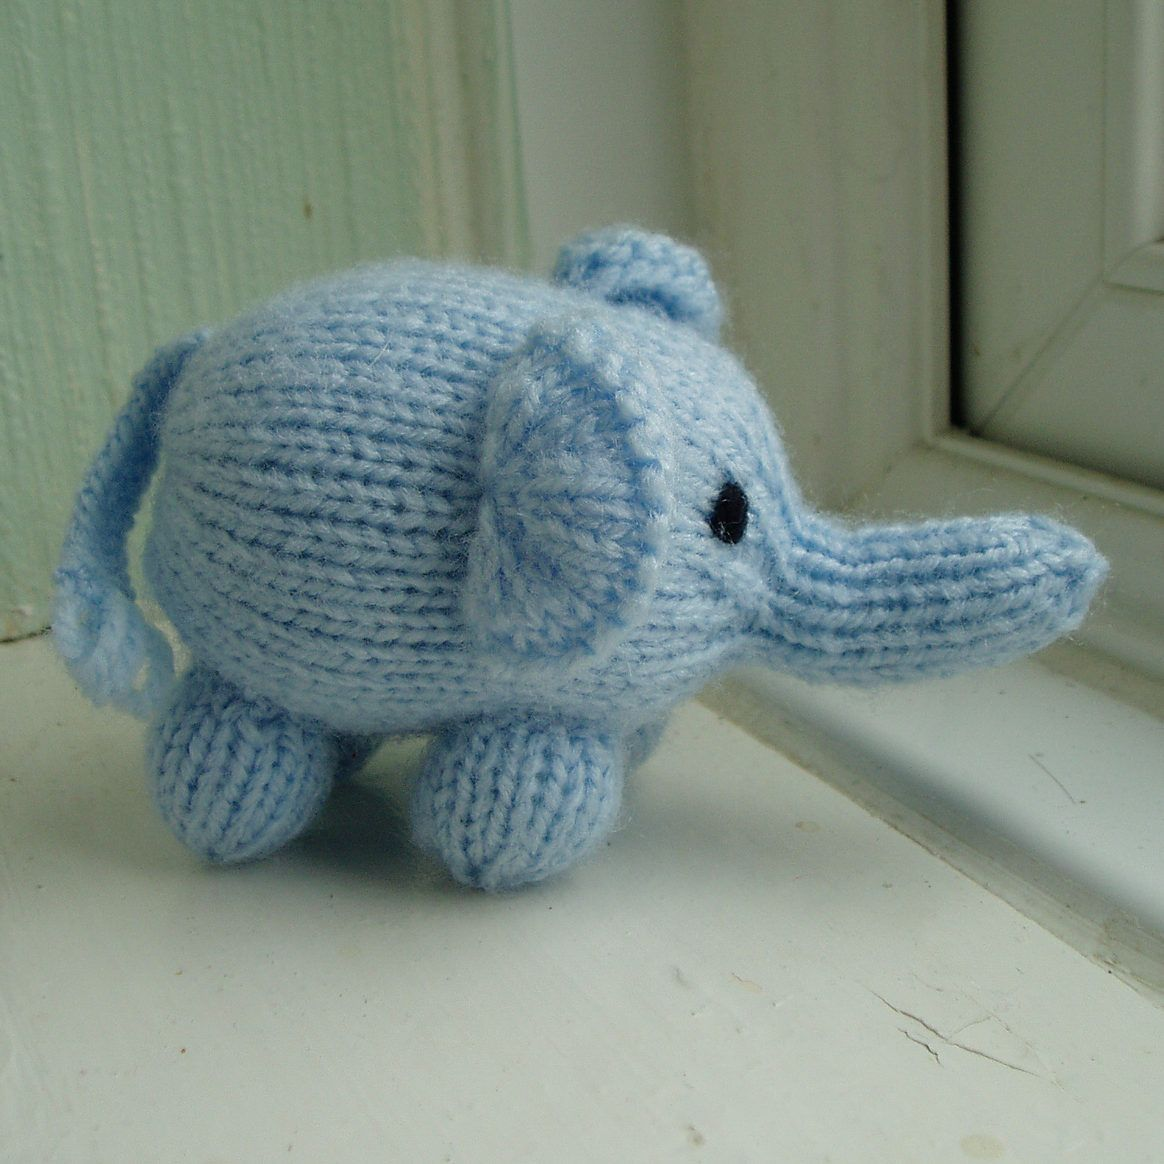 Free Knitting Pattern for Mini Elephant | Amigurami Knits ...